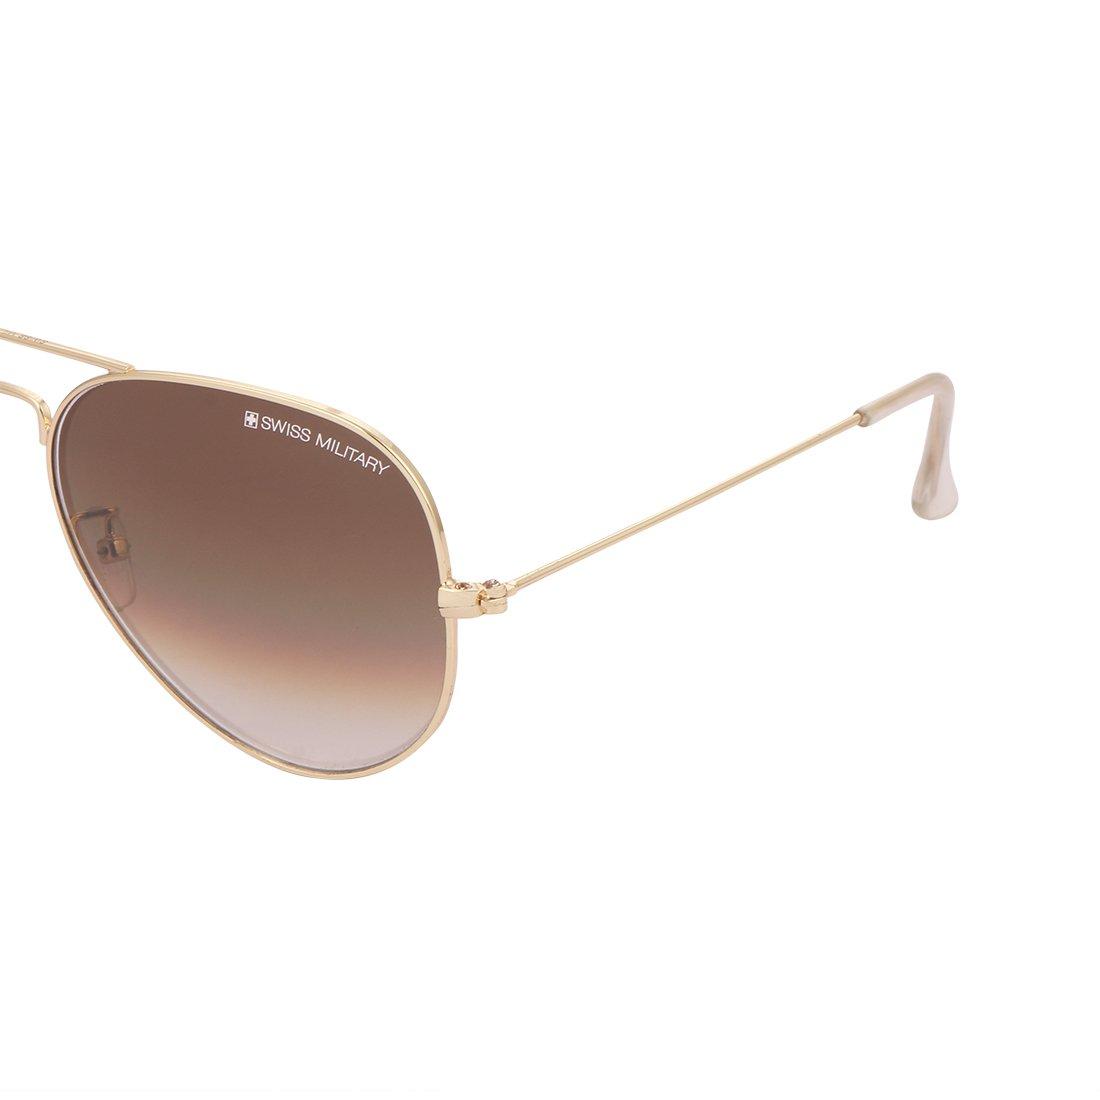 1fc7a7ccd4 Swiss Military UV Protected Aviator Unisex Sunglasses - (SUN4